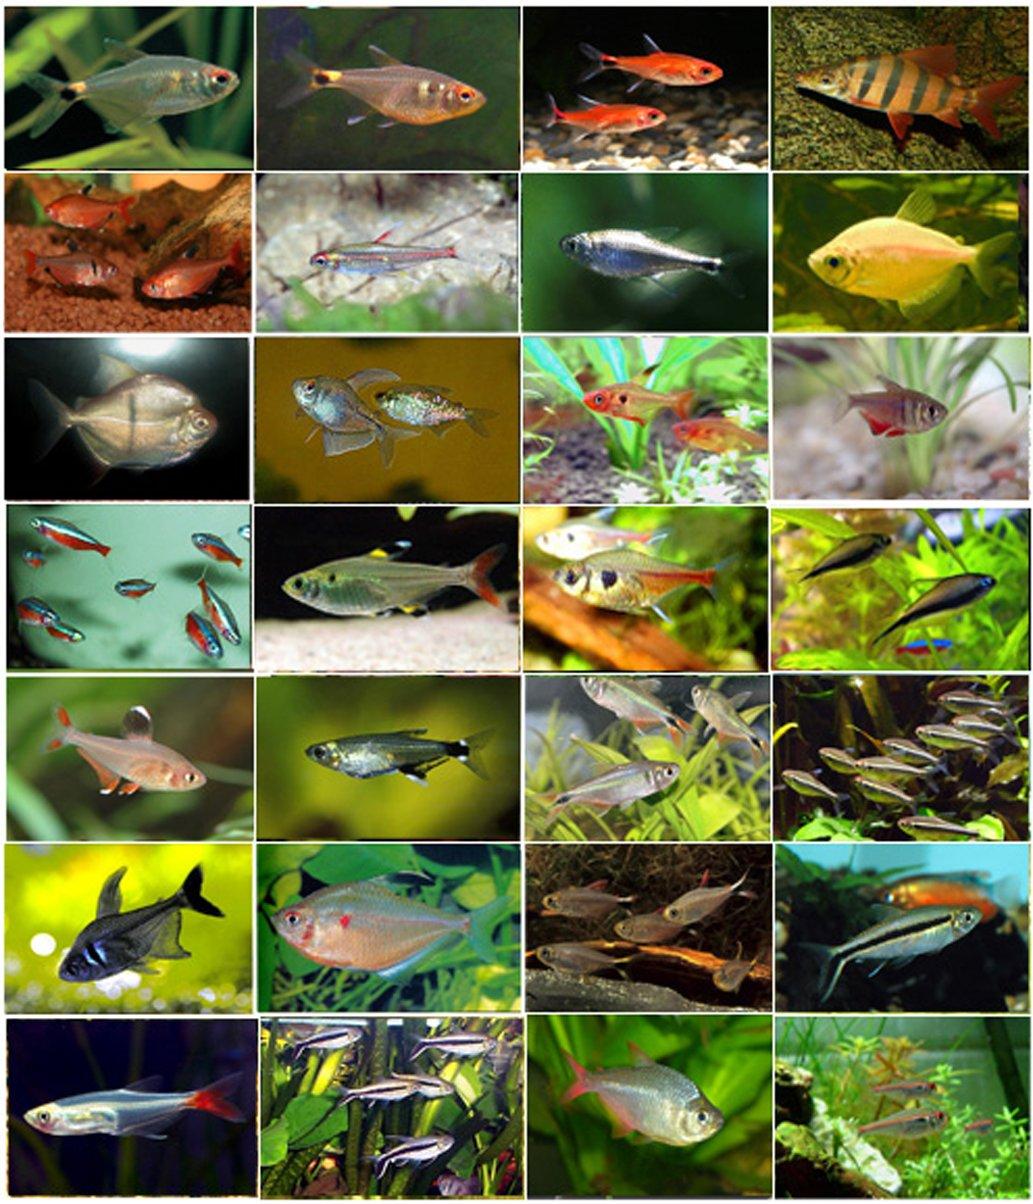 семейство Characidae – Харациновые